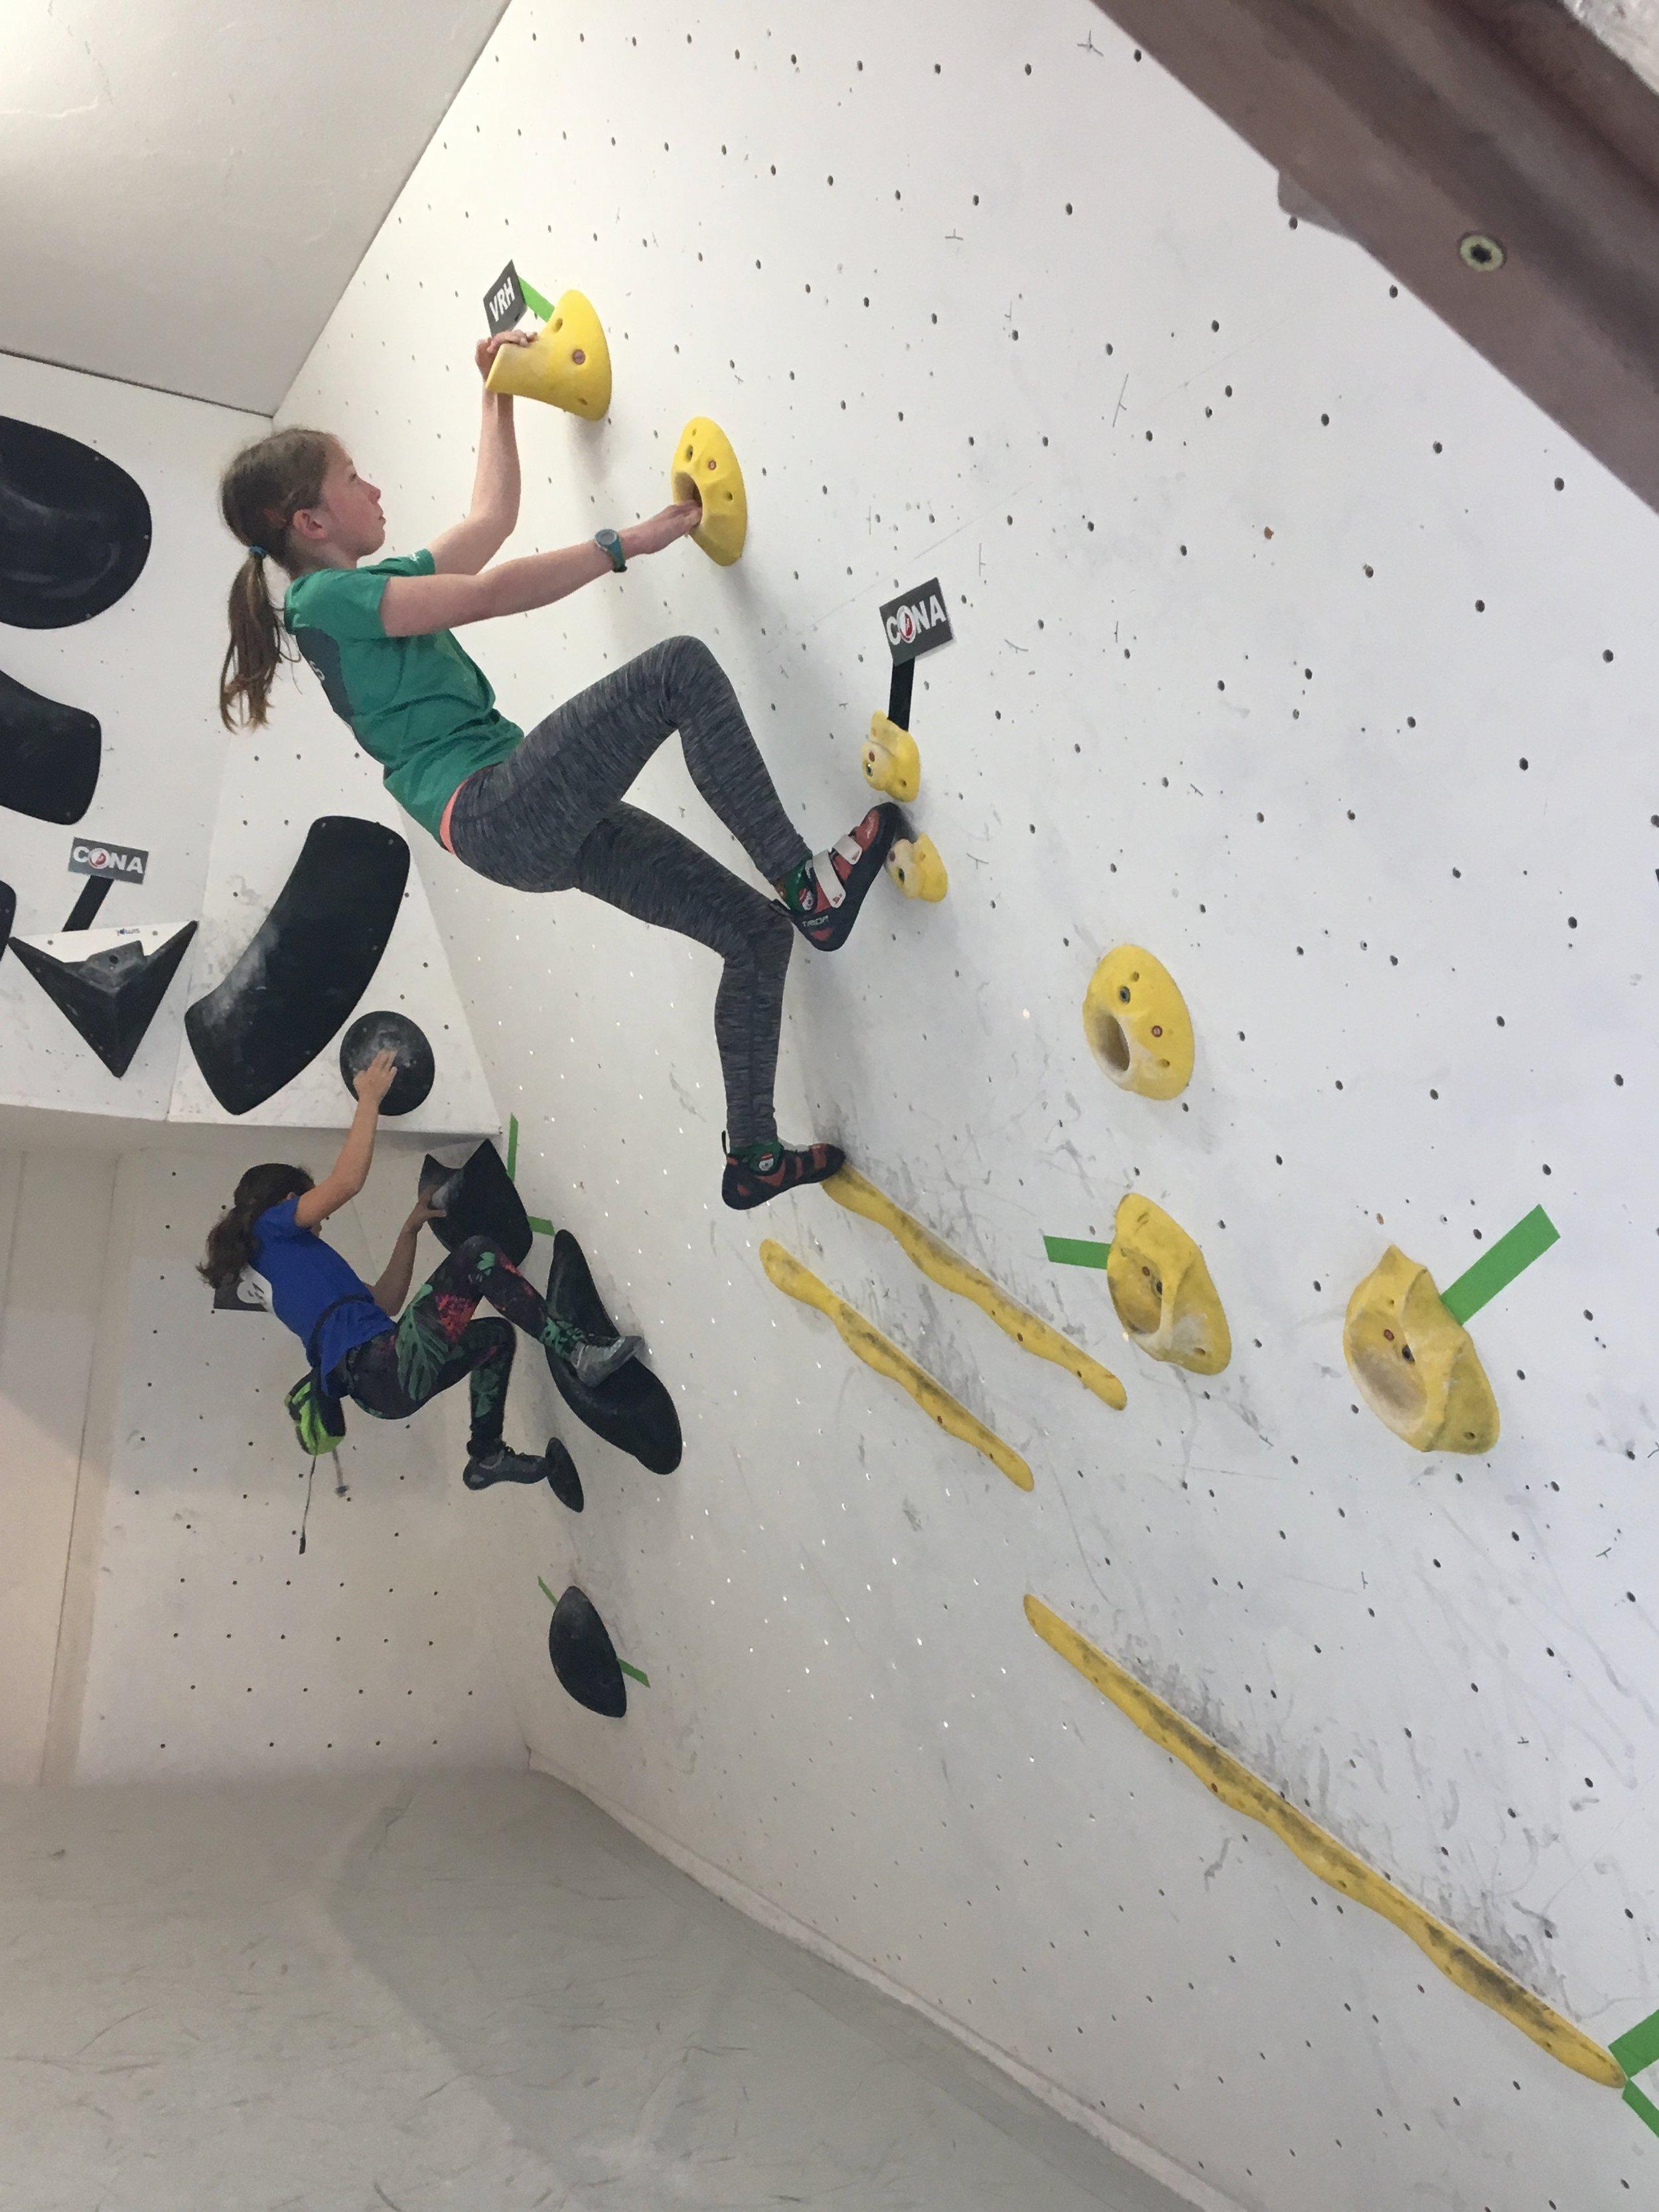 Plezalni tekma Grif Kamnik 2019_194.jpg